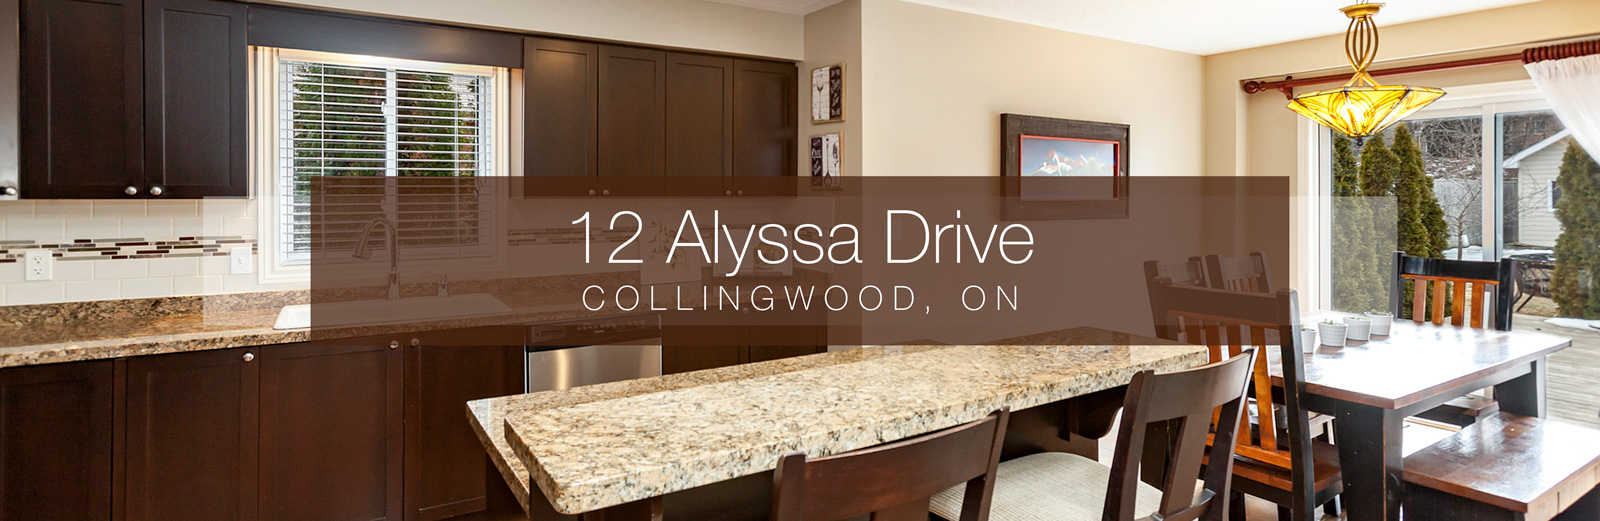 12-alyssa-drive-collingwood-ontario.jpg